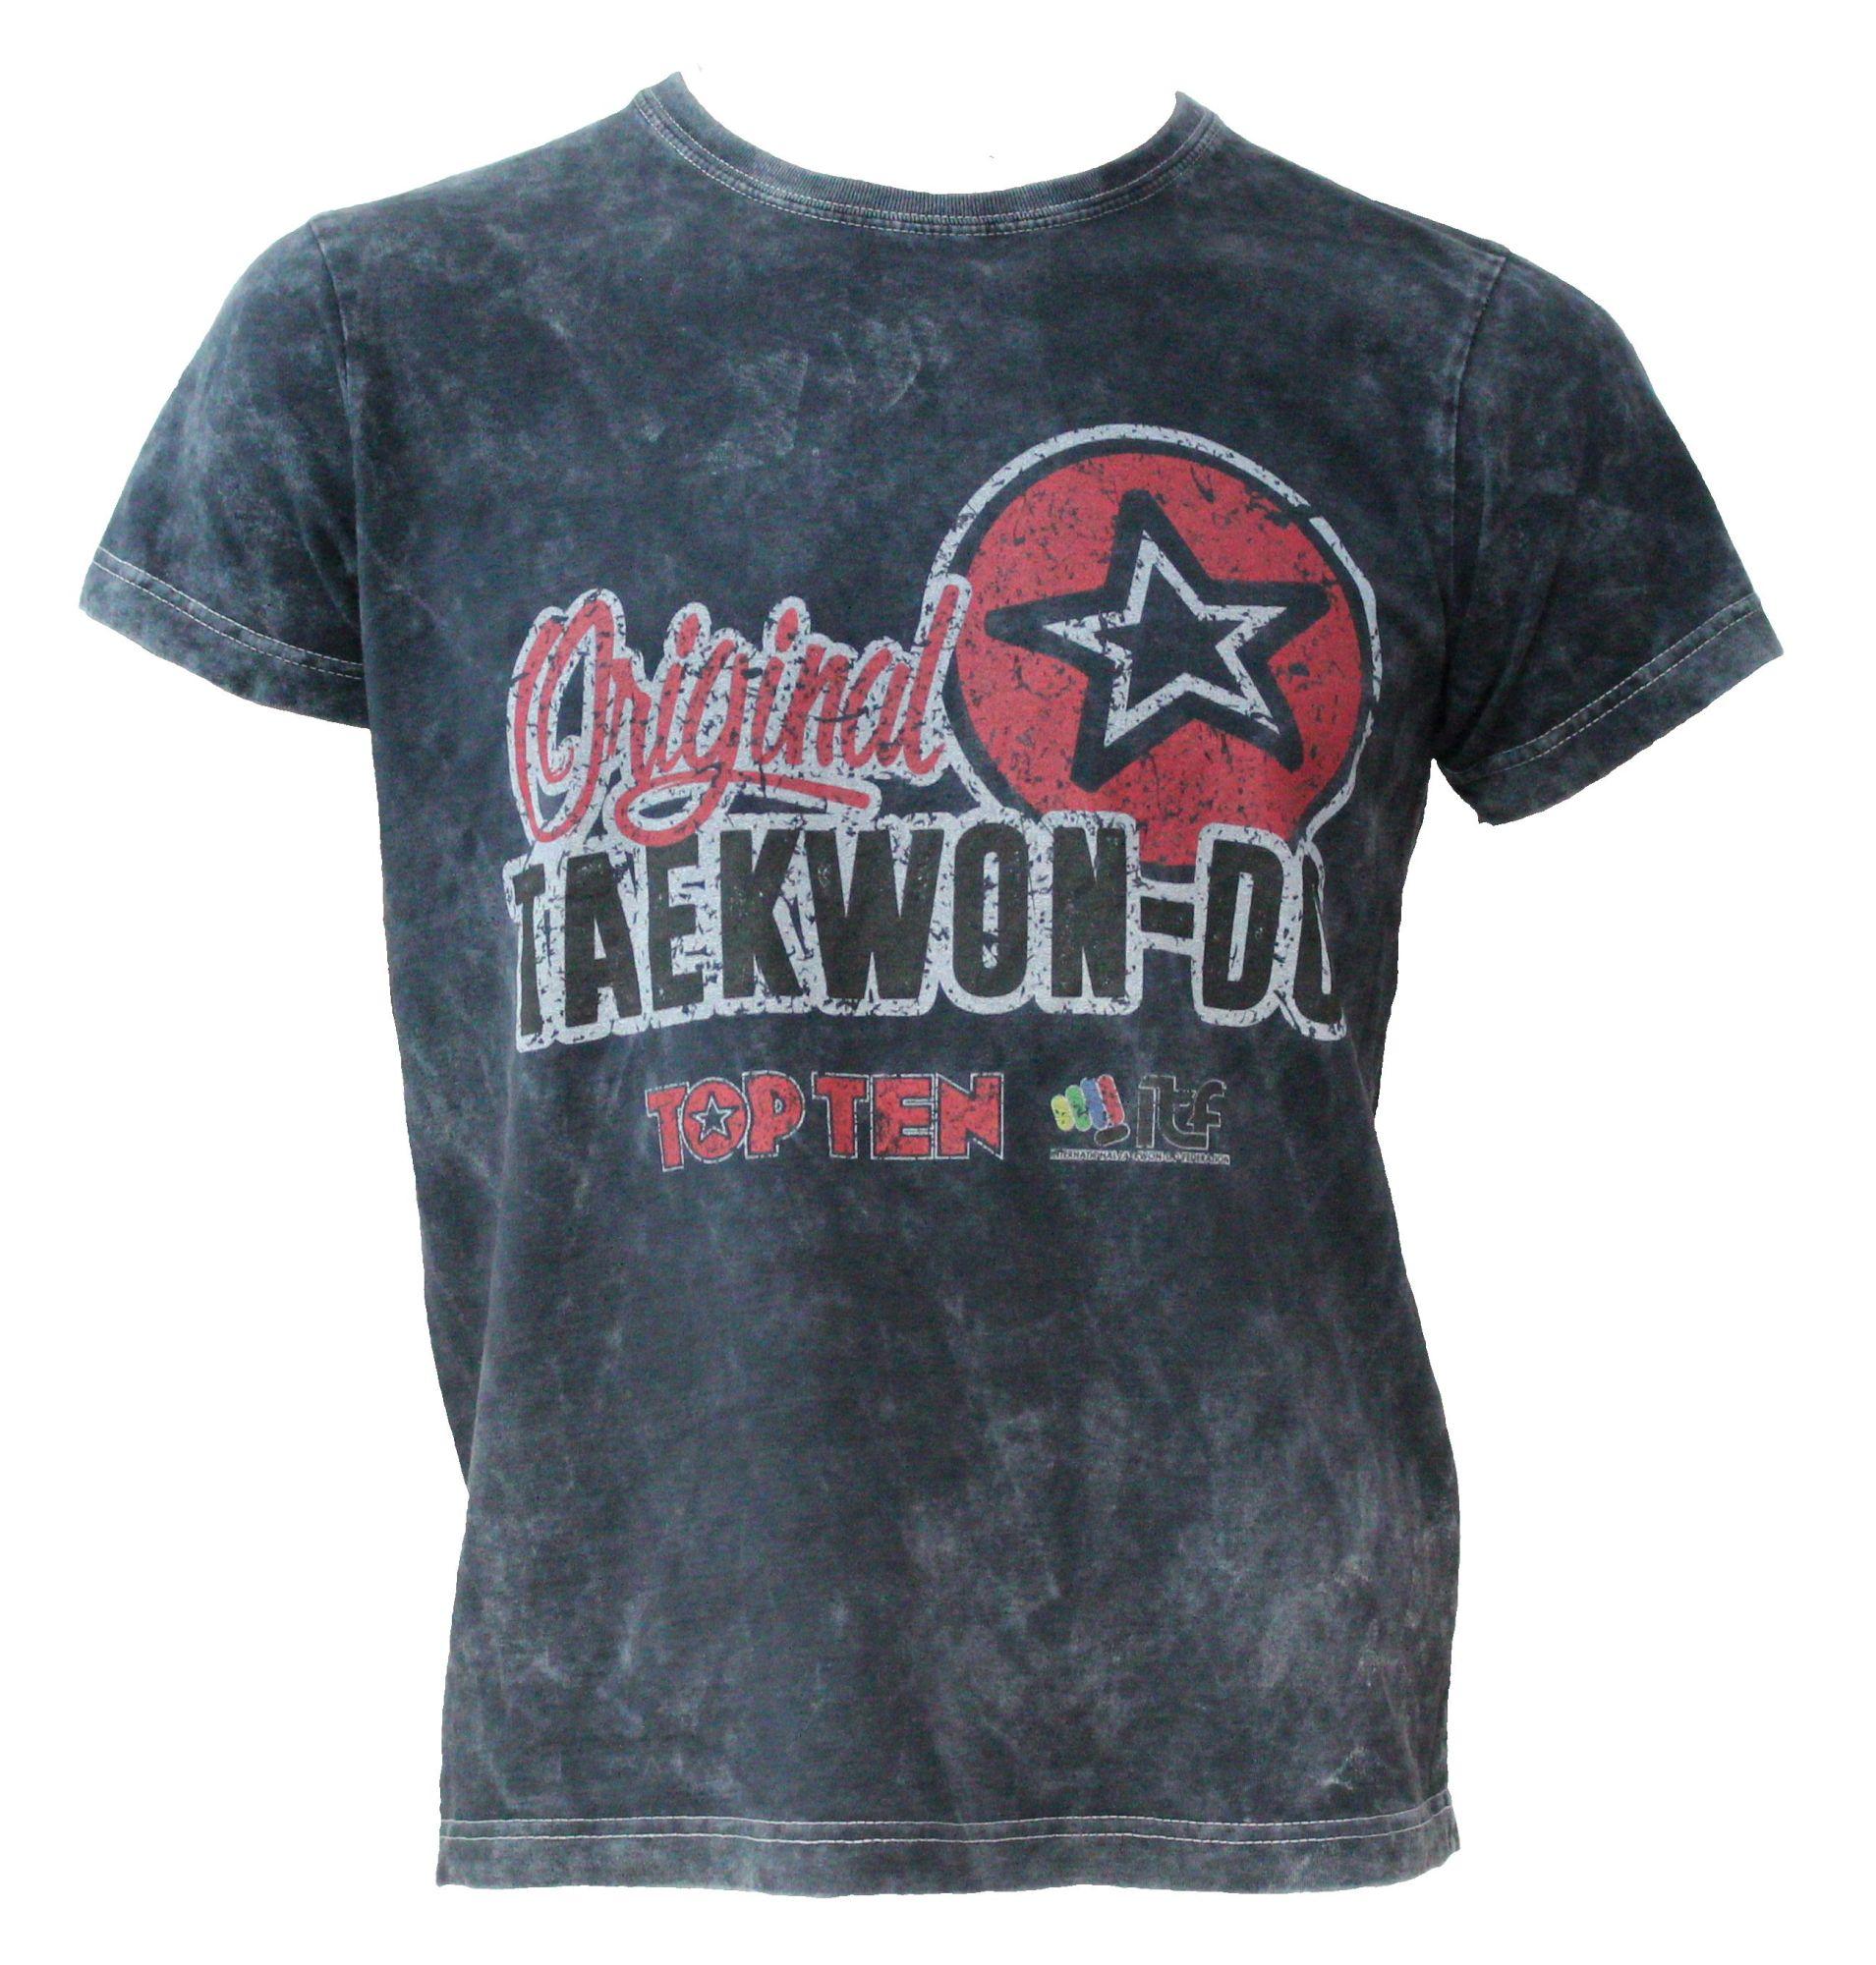 "TOP TEN T-Shirt ""ITF Original Taekwondo Retrolook"" Grijs"